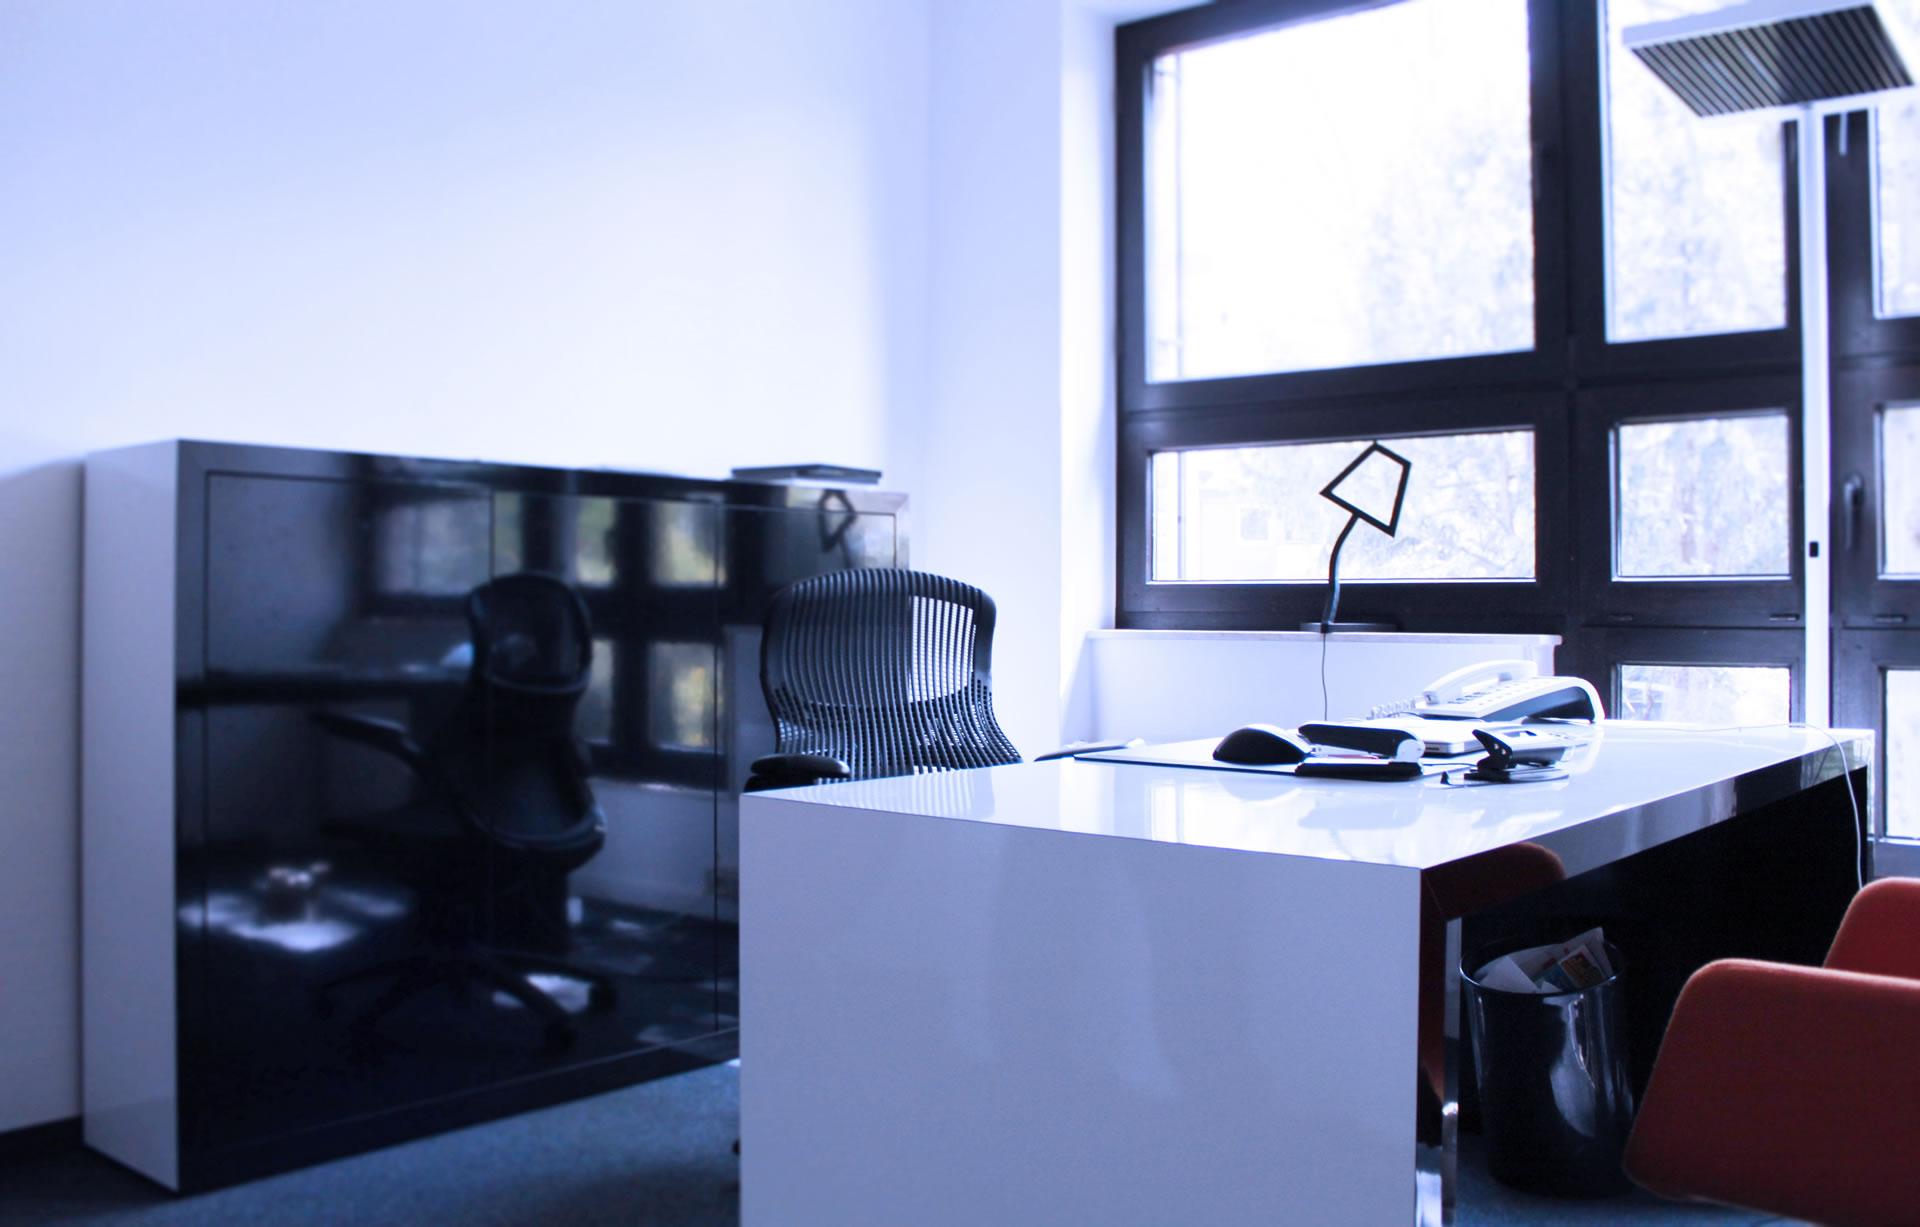 beton regal f r holz kamin kreative ideen f r ihr zuhause design. Black Bedroom Furniture Sets. Home Design Ideas